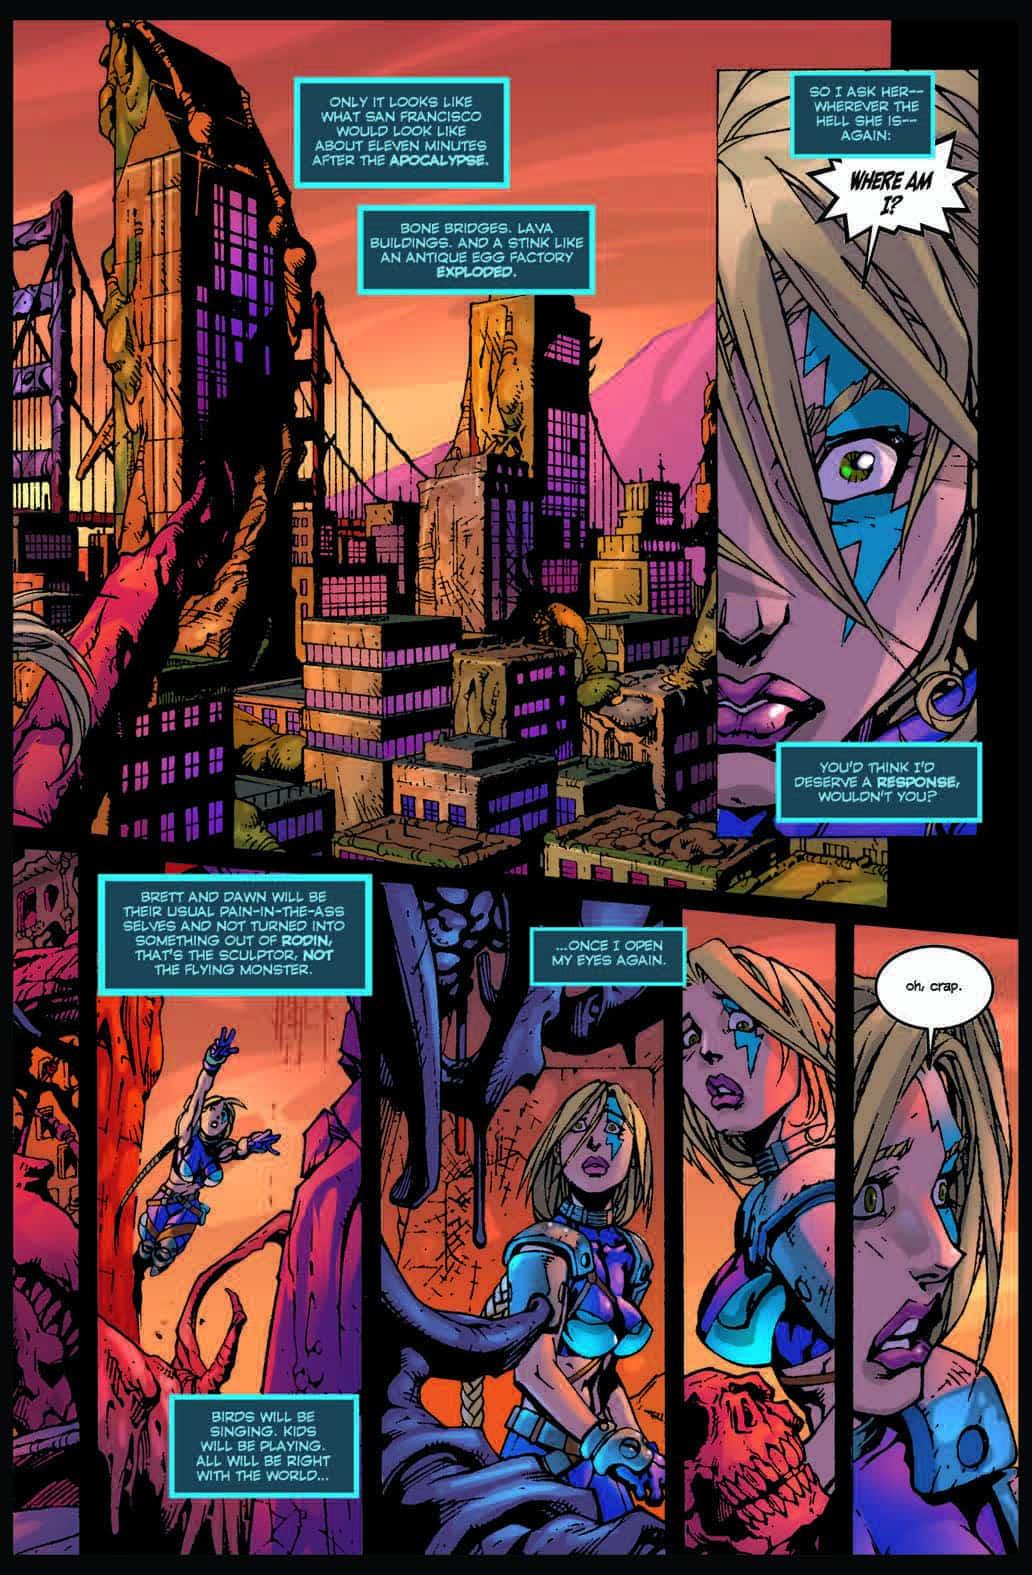 10th-Muse-Vol-2-the-Image-Comics-Run-Part-2-Image-03